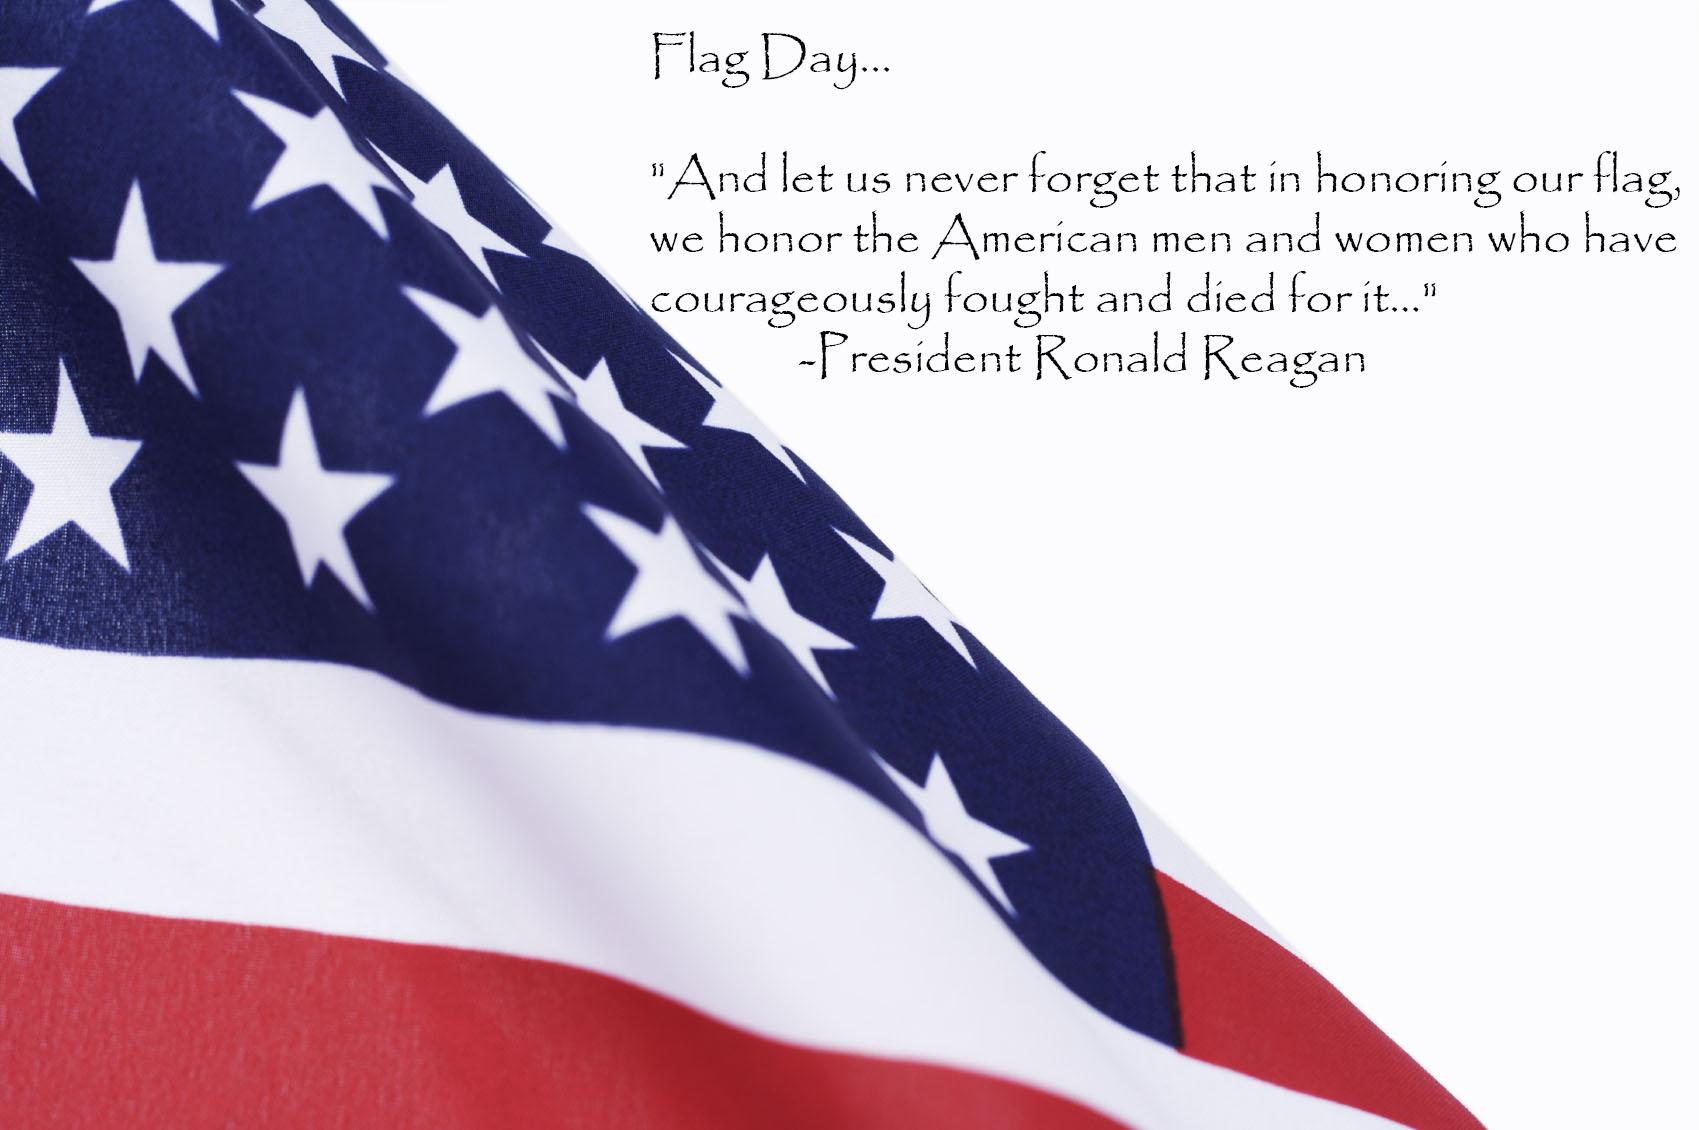 flagday2013.jpg